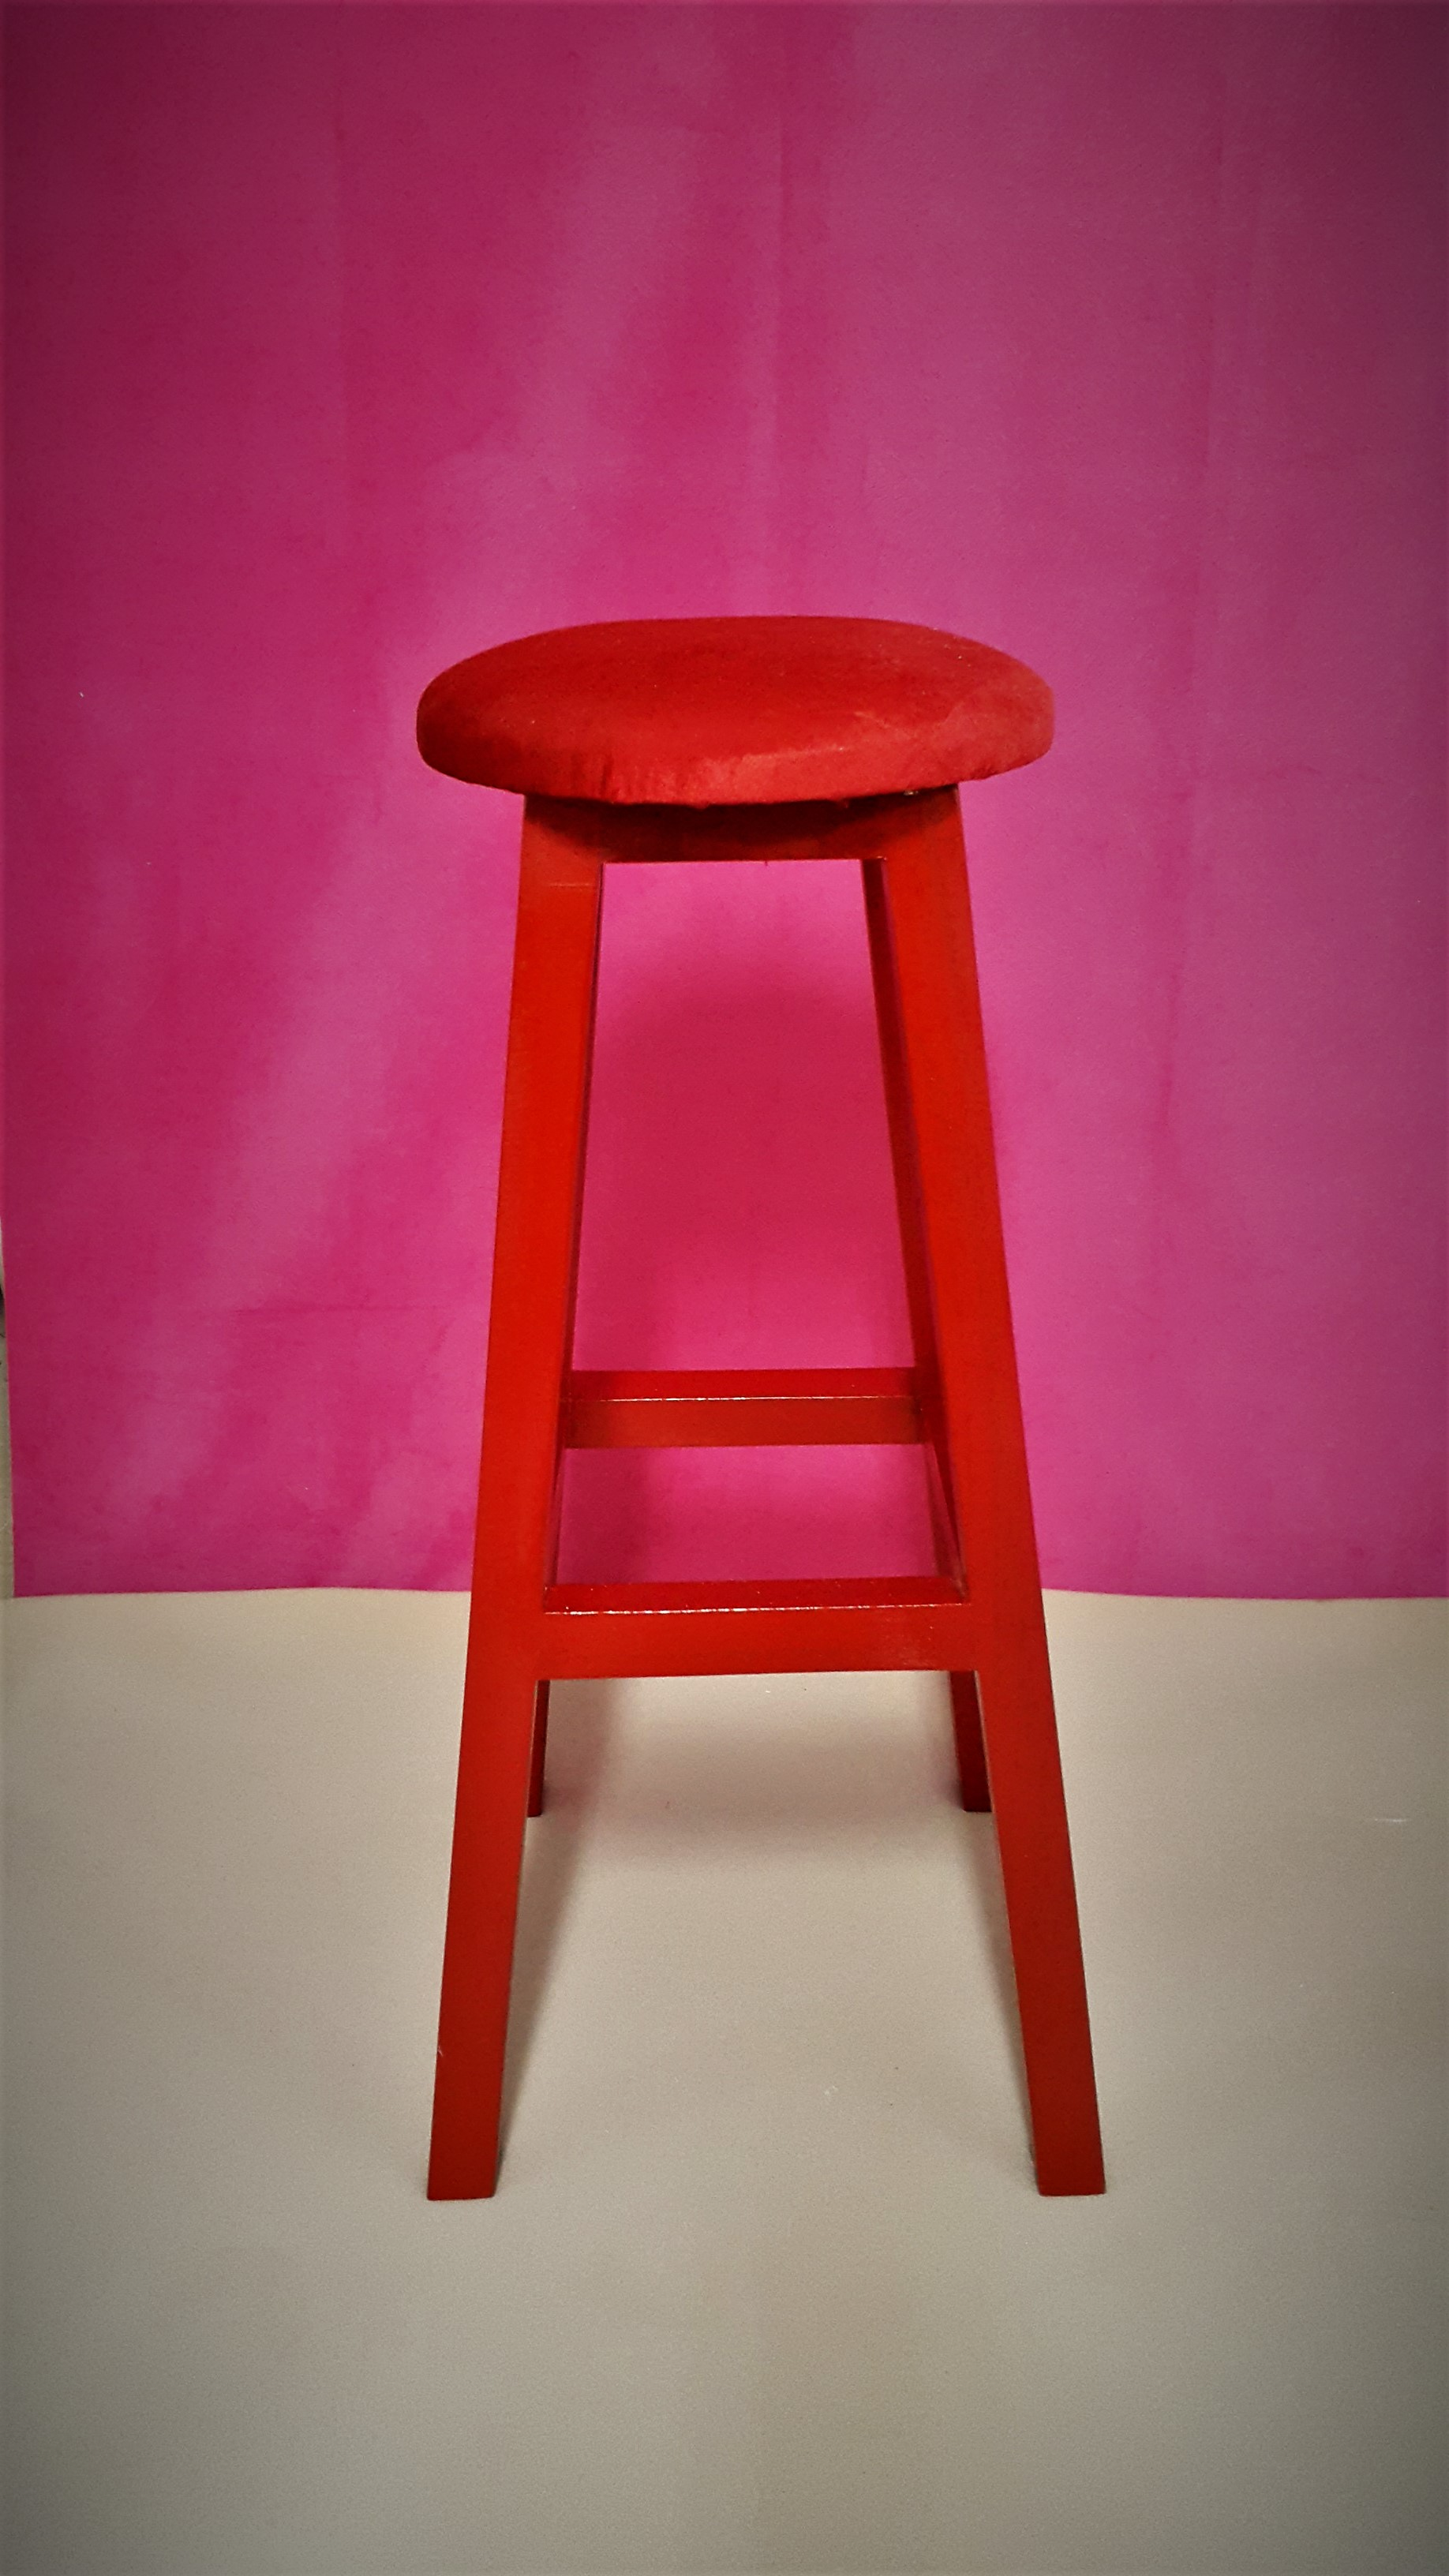 kırmızı tabure ahşap bar taburesi